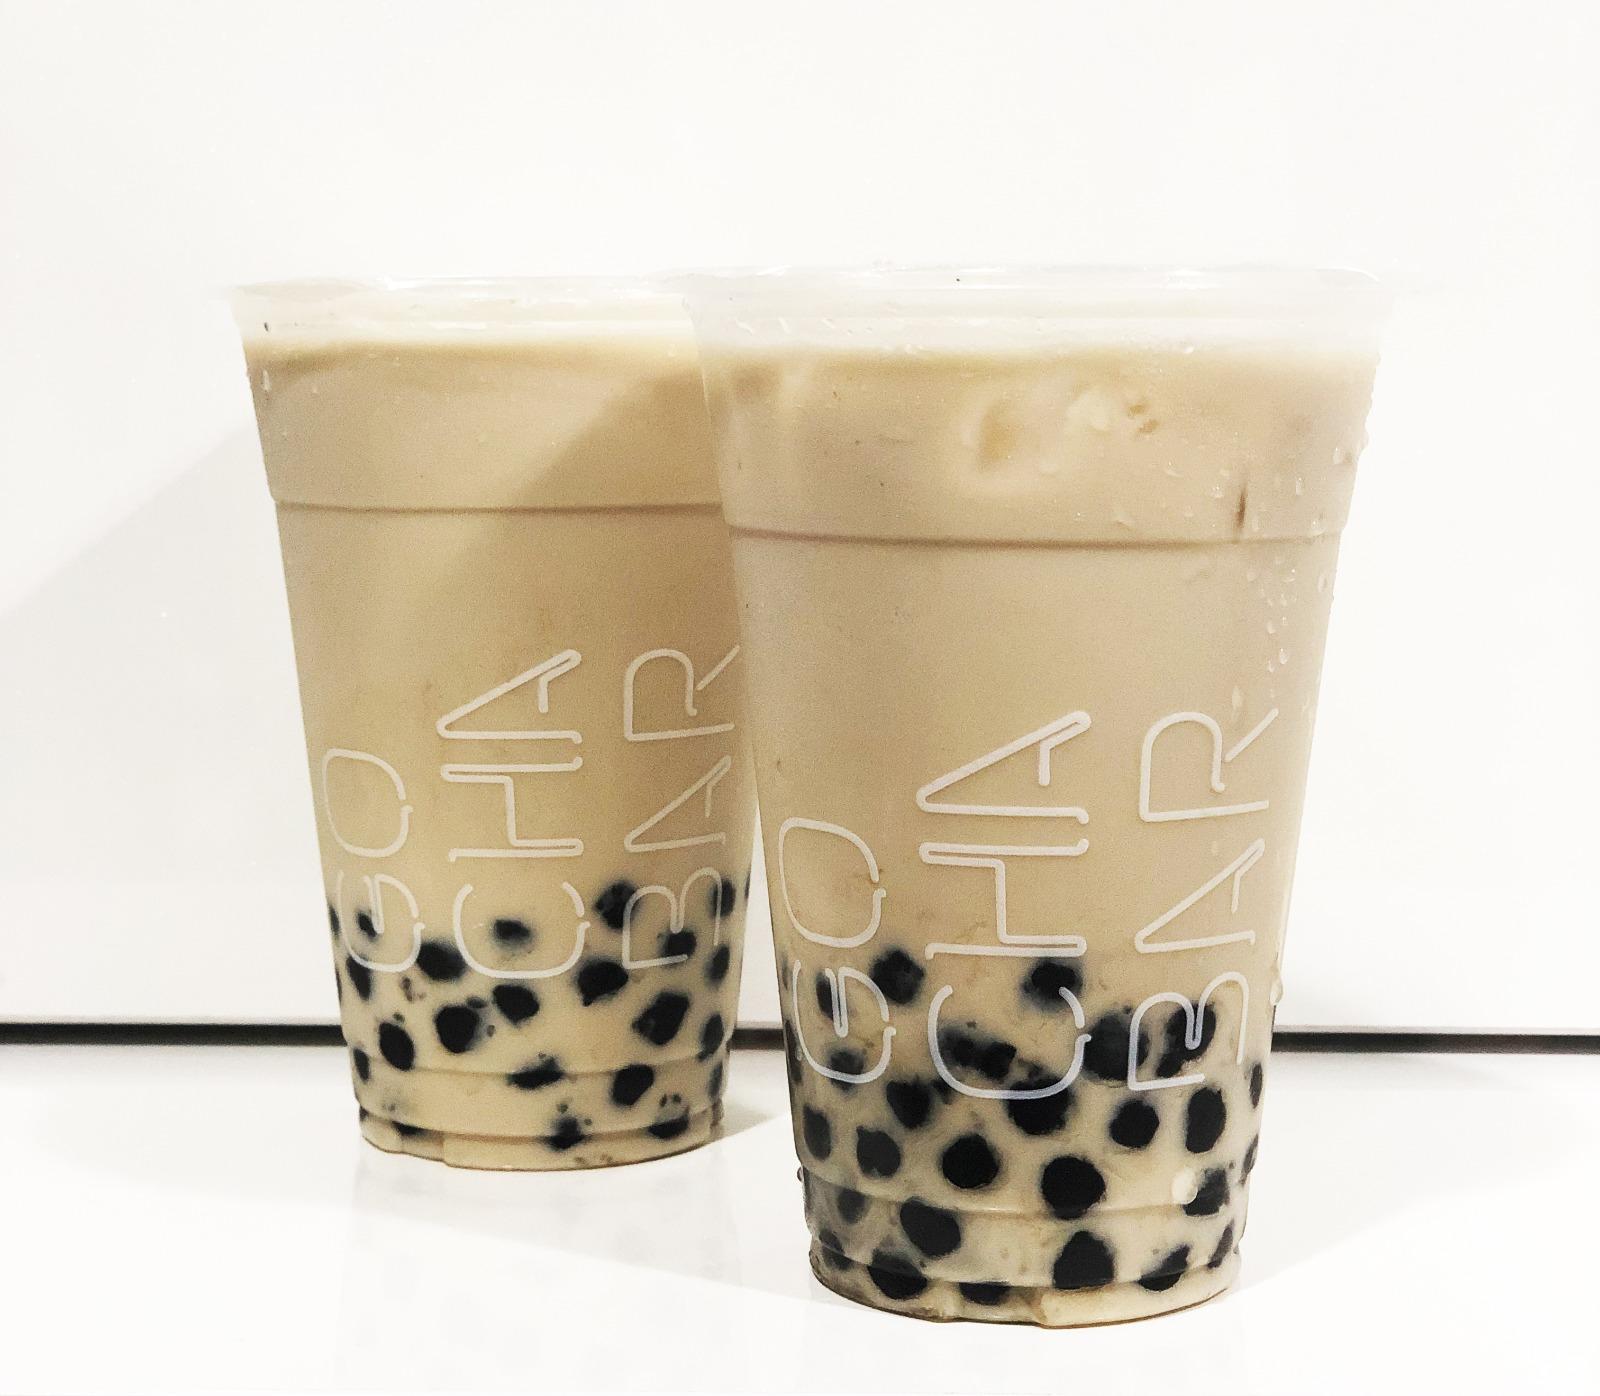 1 x Oolong Milk Tea with Pearl